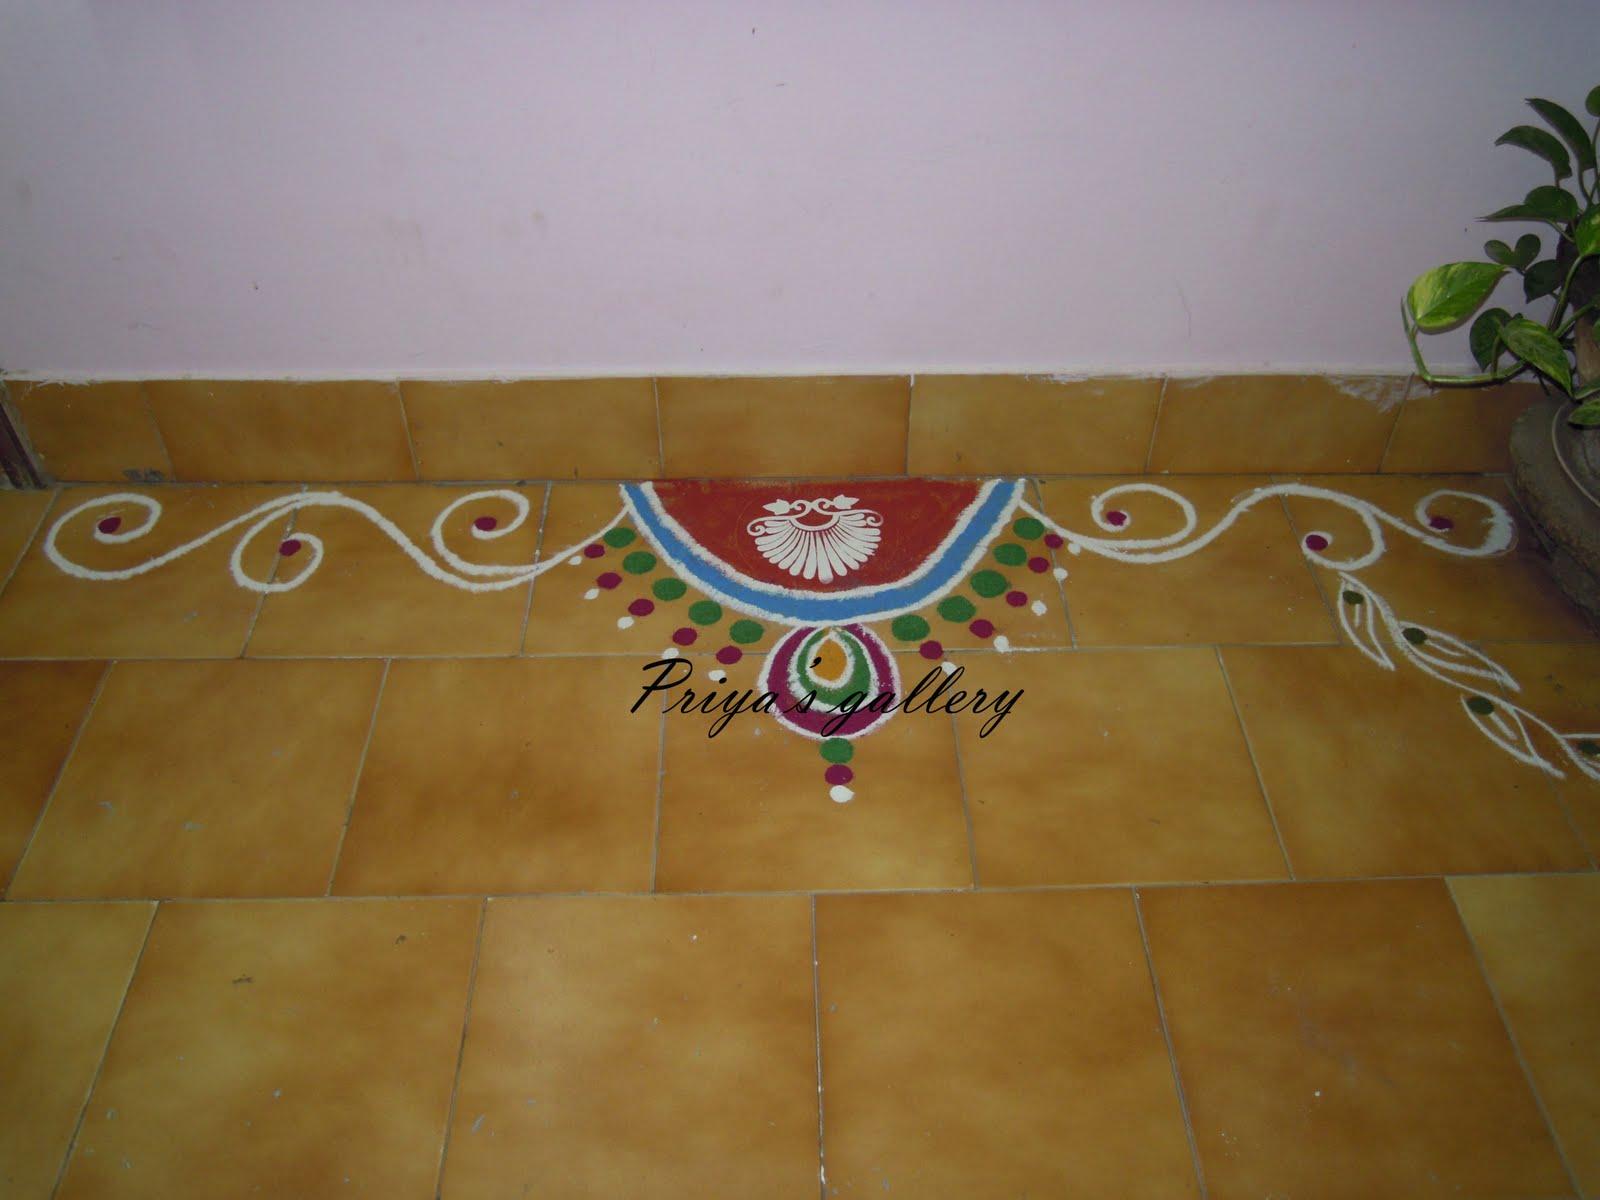 Rangoli designs & Priyau0027s Gallery: Rangoli designs